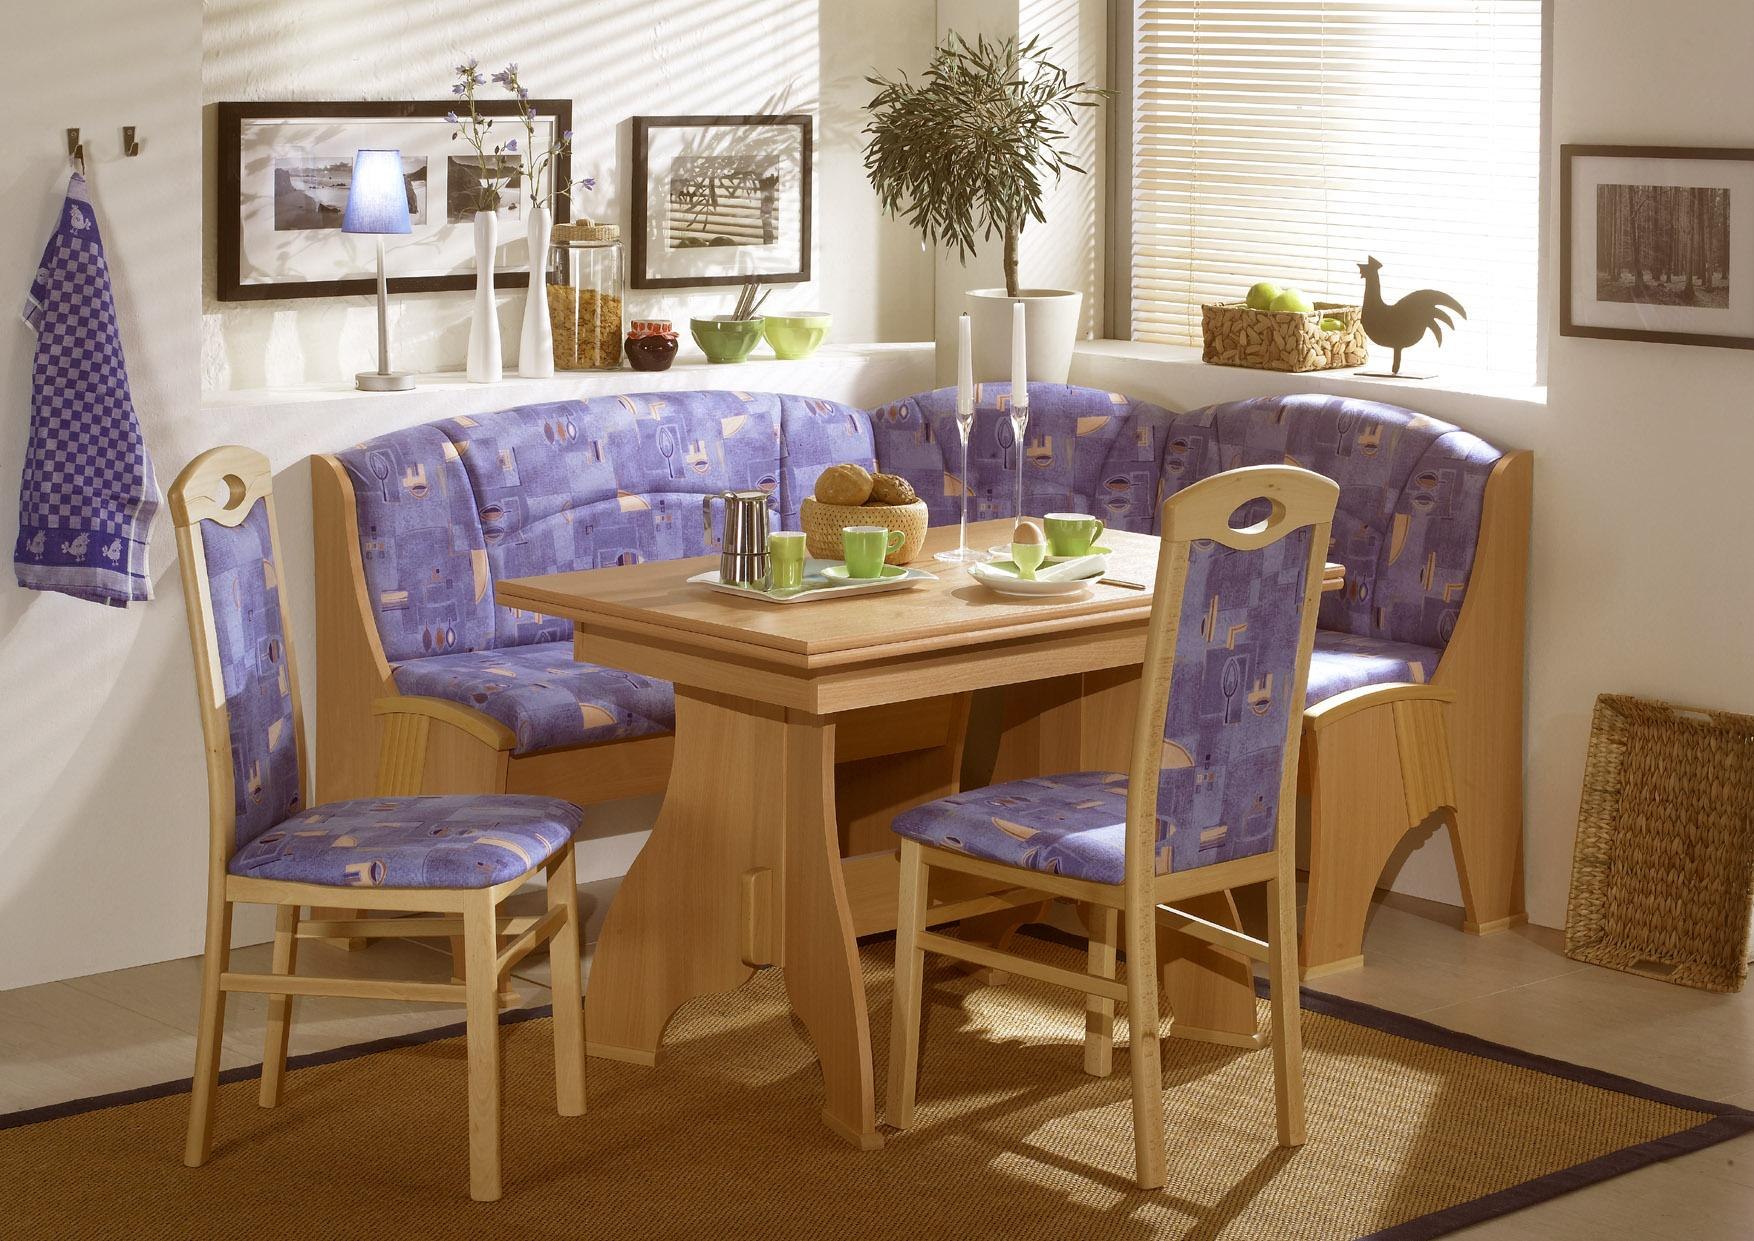 Image of: breakfast nook table